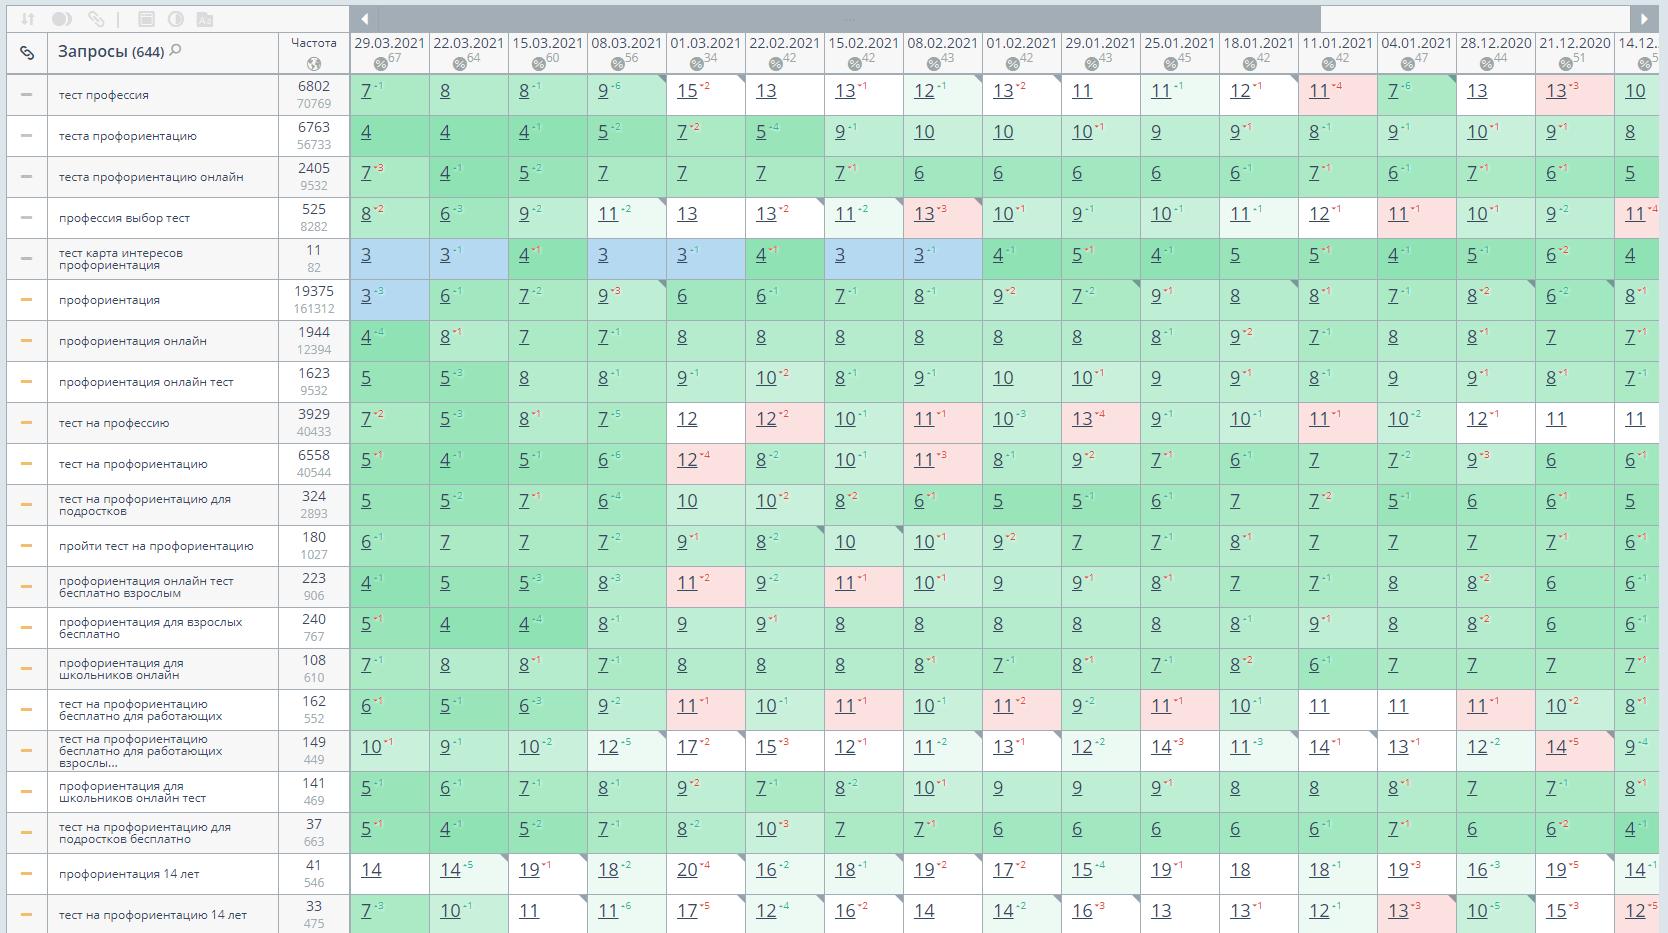 Рост позиций в Яндексе по региону Москва